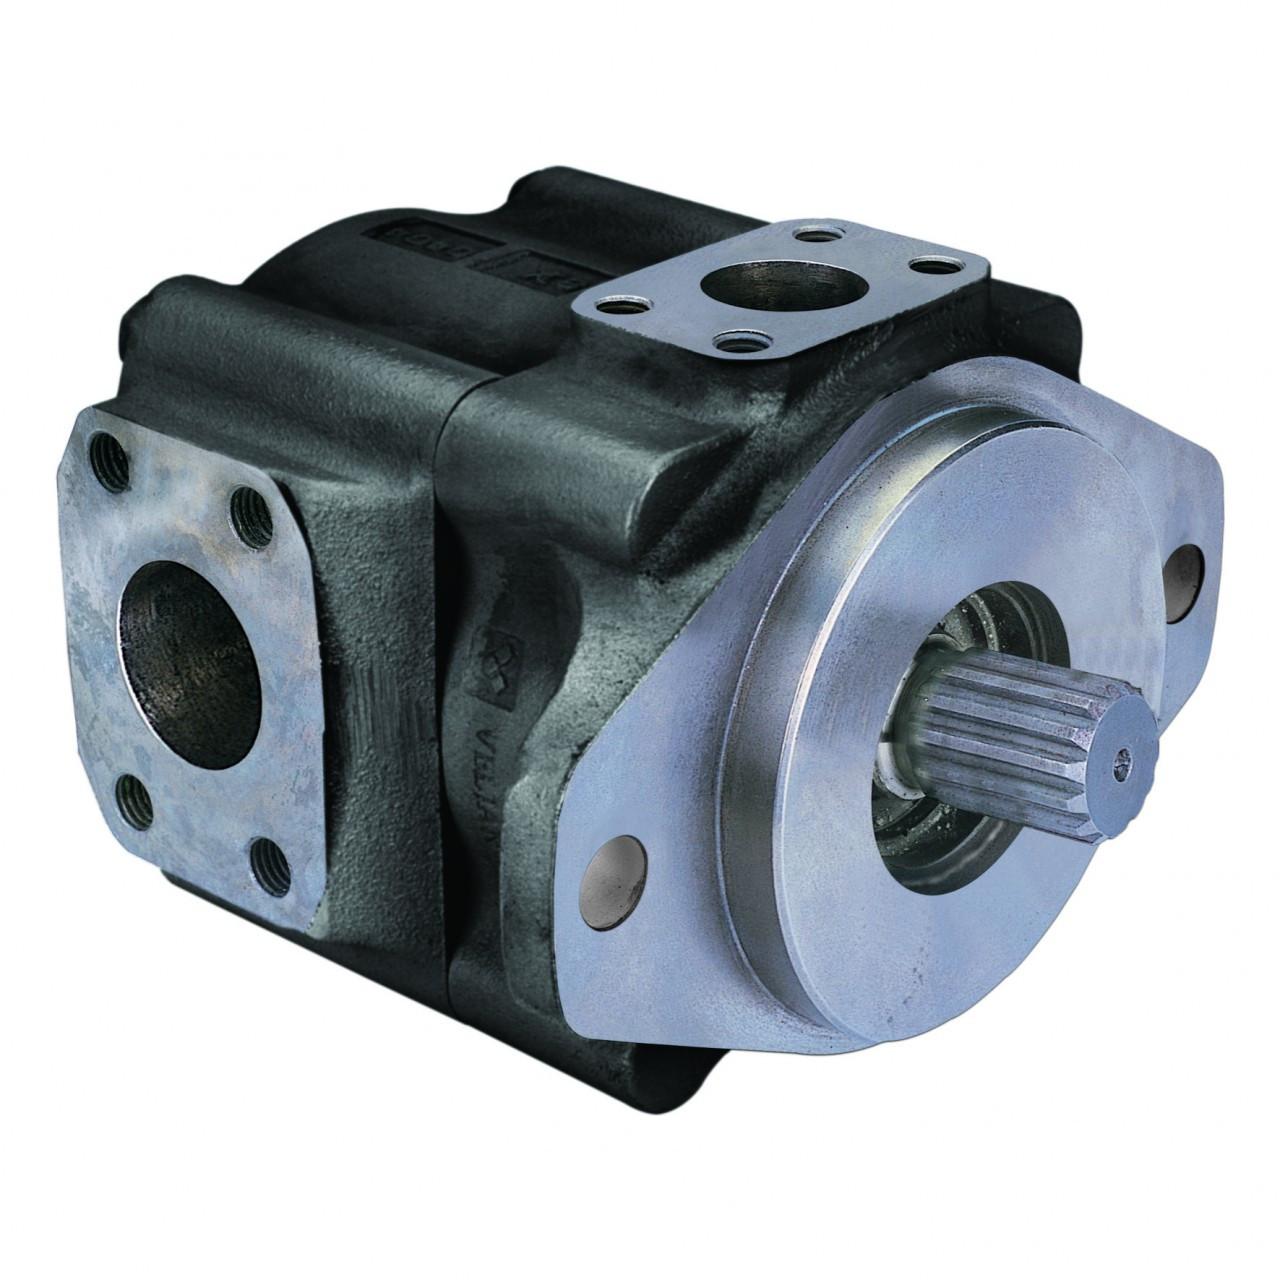 Veljan Single Vane Pump - VT6CP - Rons Drivelines | Drivelines | Driveshafts | Differentials